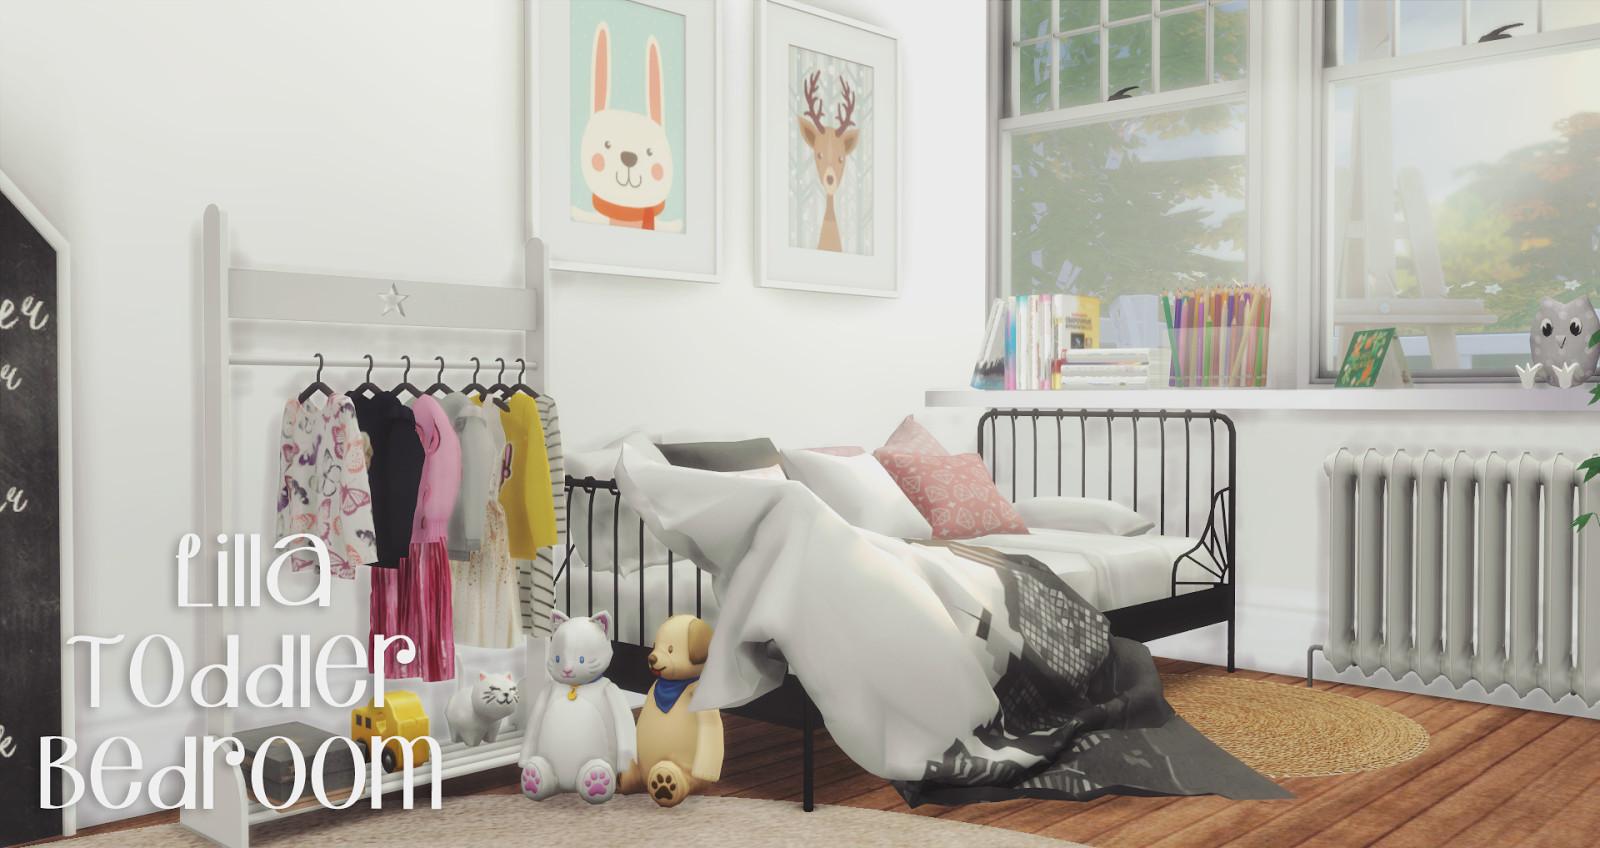 Toddler Bedroom Furniture Set Beautiful Lilla toddler Bedroom New Set